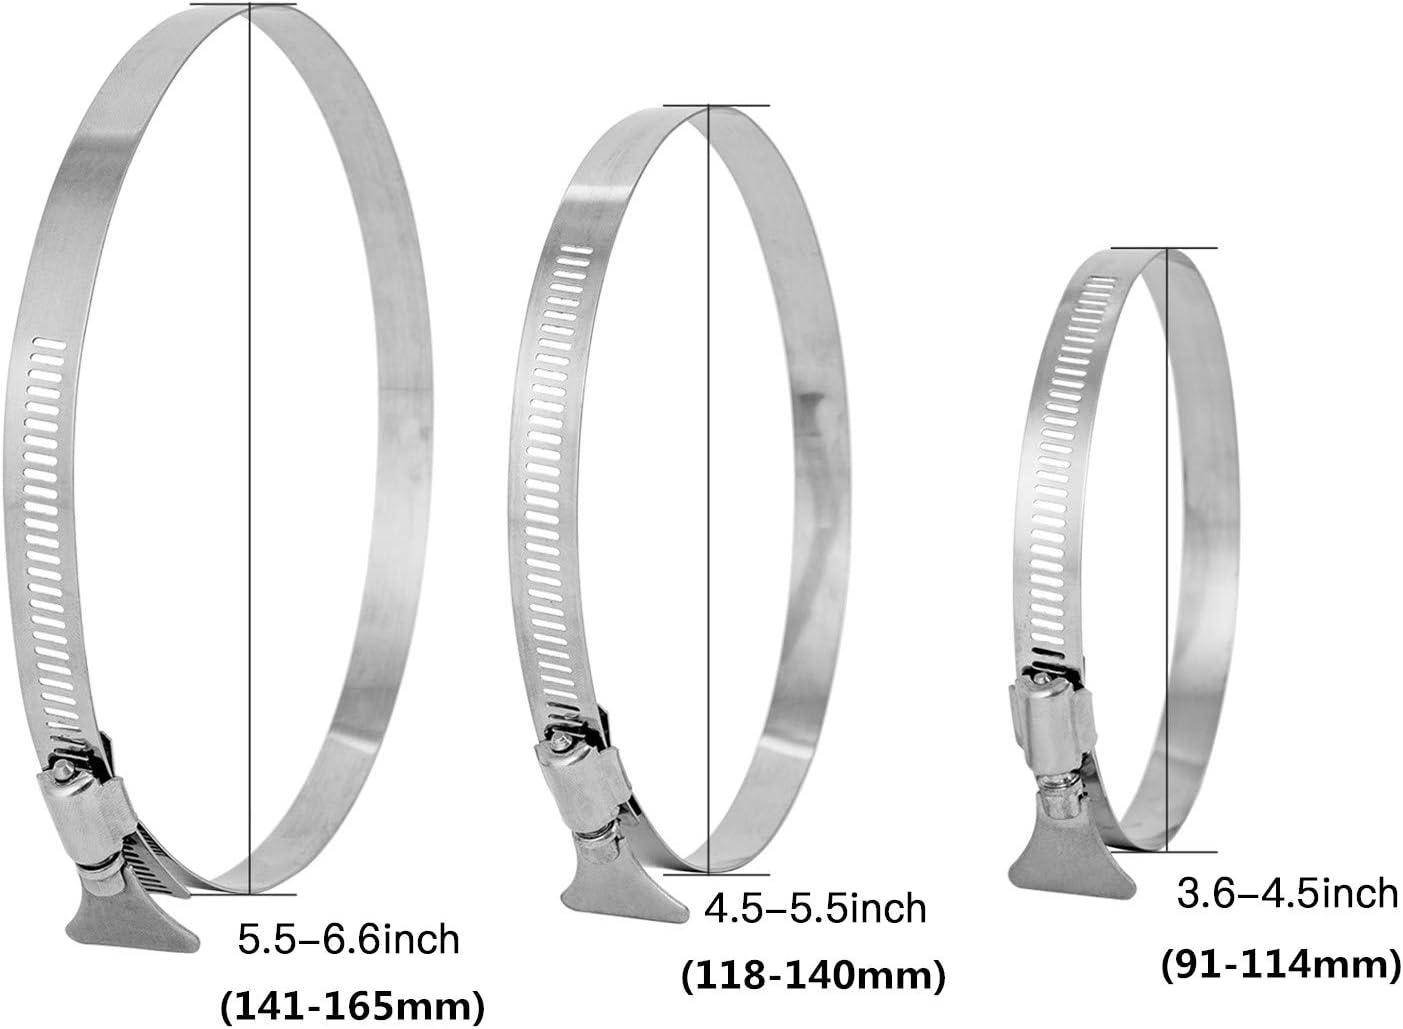 Di/ámetro 91-114mm Abrazadera de Manguera para Tubos Hon/&Guan Clips de Manguera de Acero Inoxidable con Mango Ajustable 2 piezas